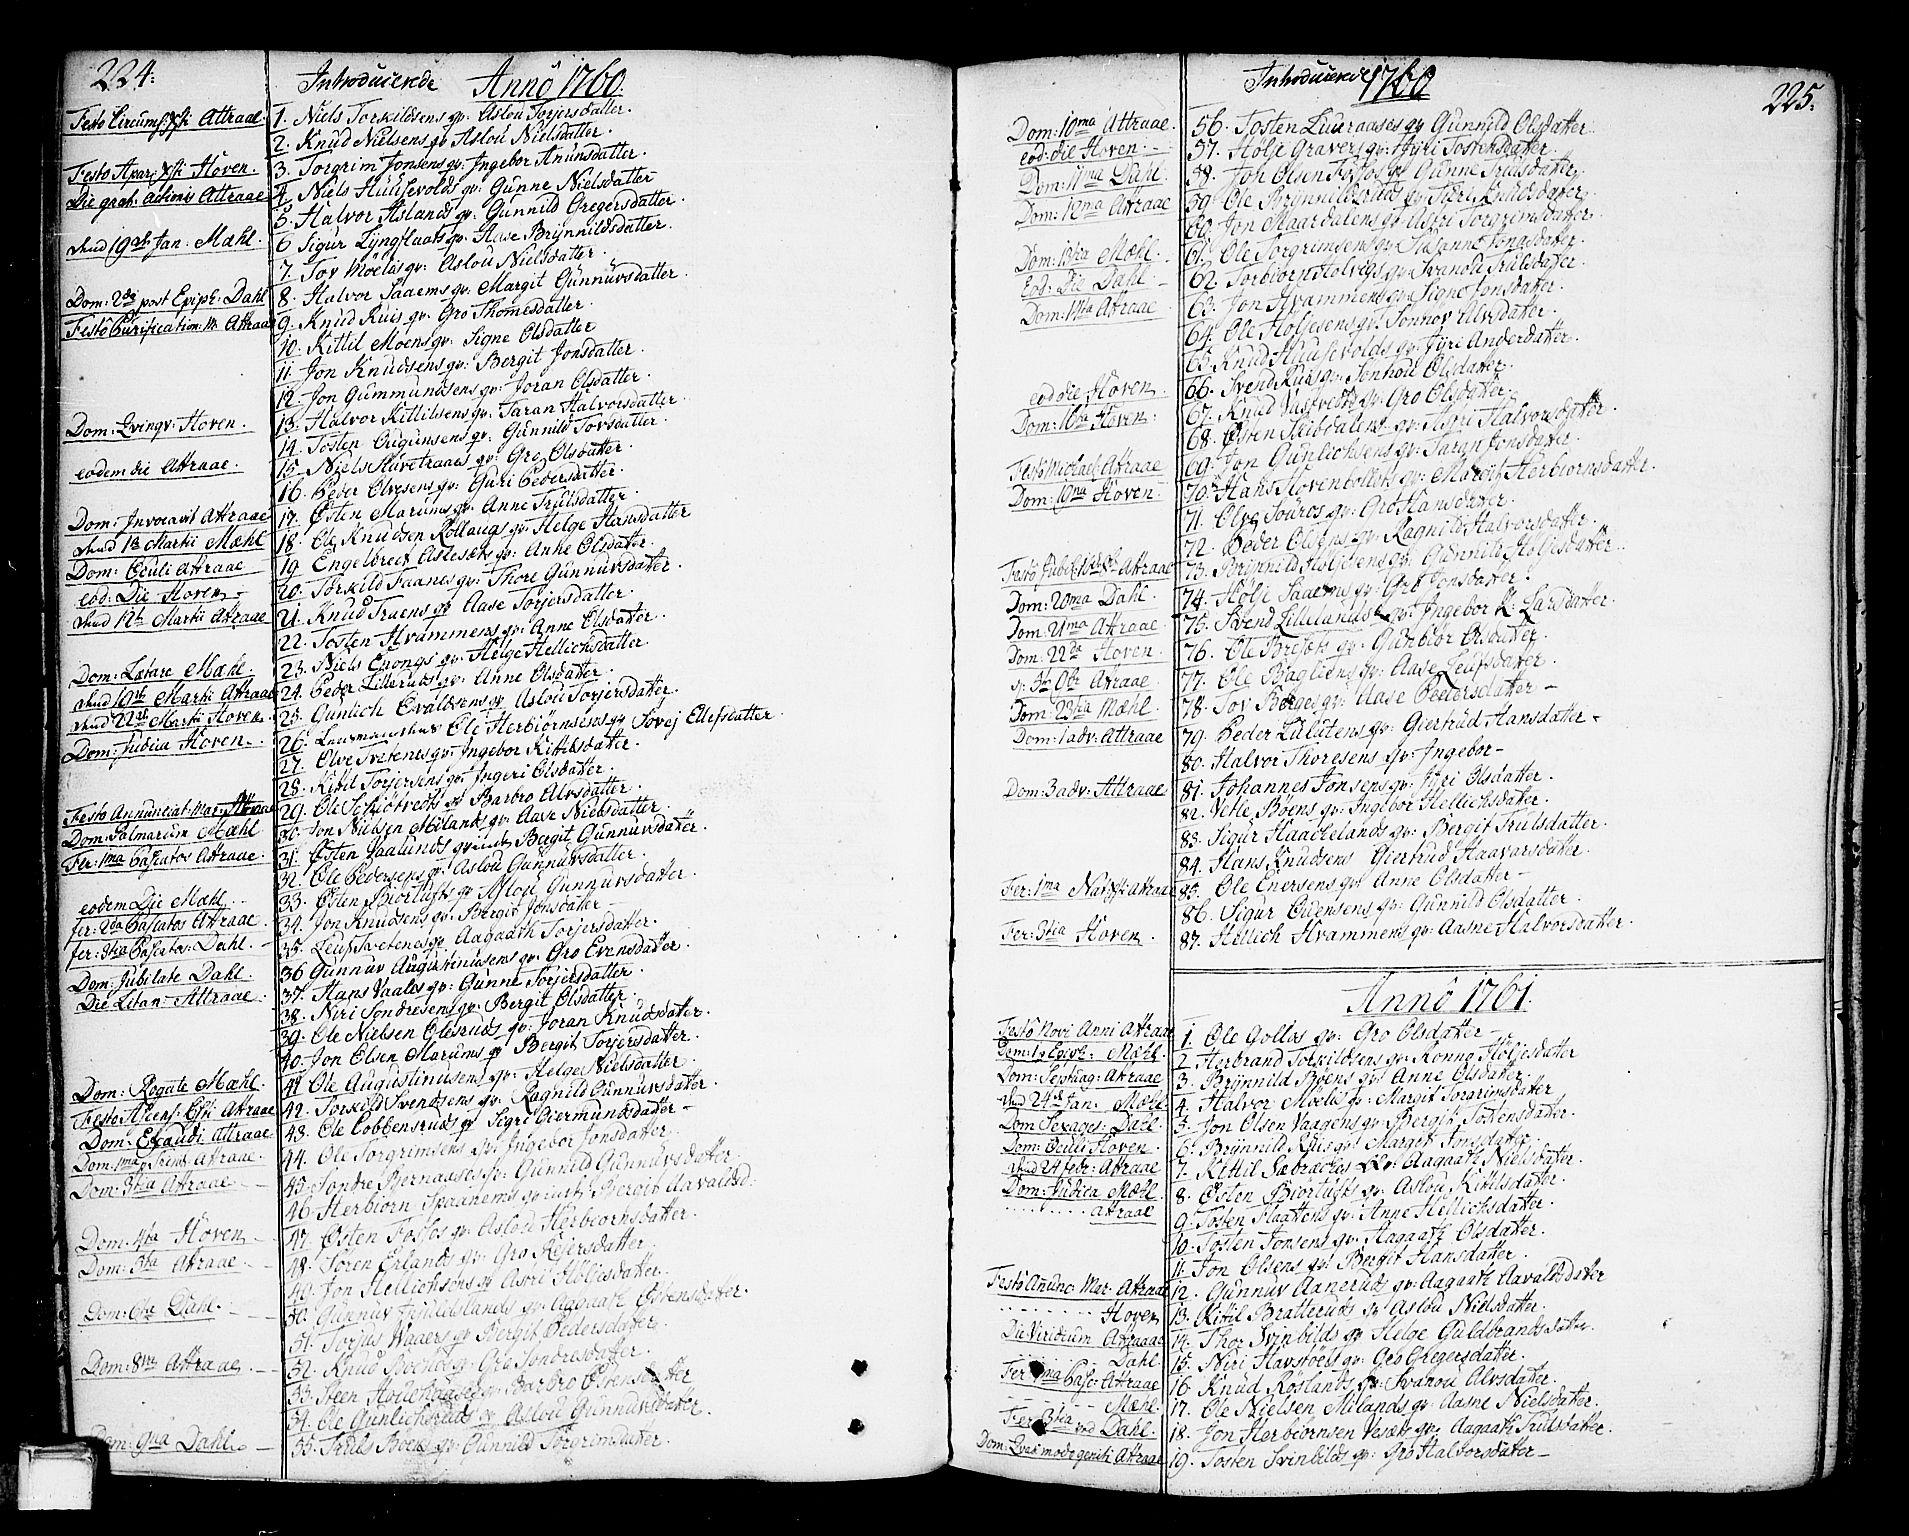 SAKO, Tinn kirkebøker, F/Fa/L0002: Ministerialbok nr. I 2, 1757-1810, s. 224-225